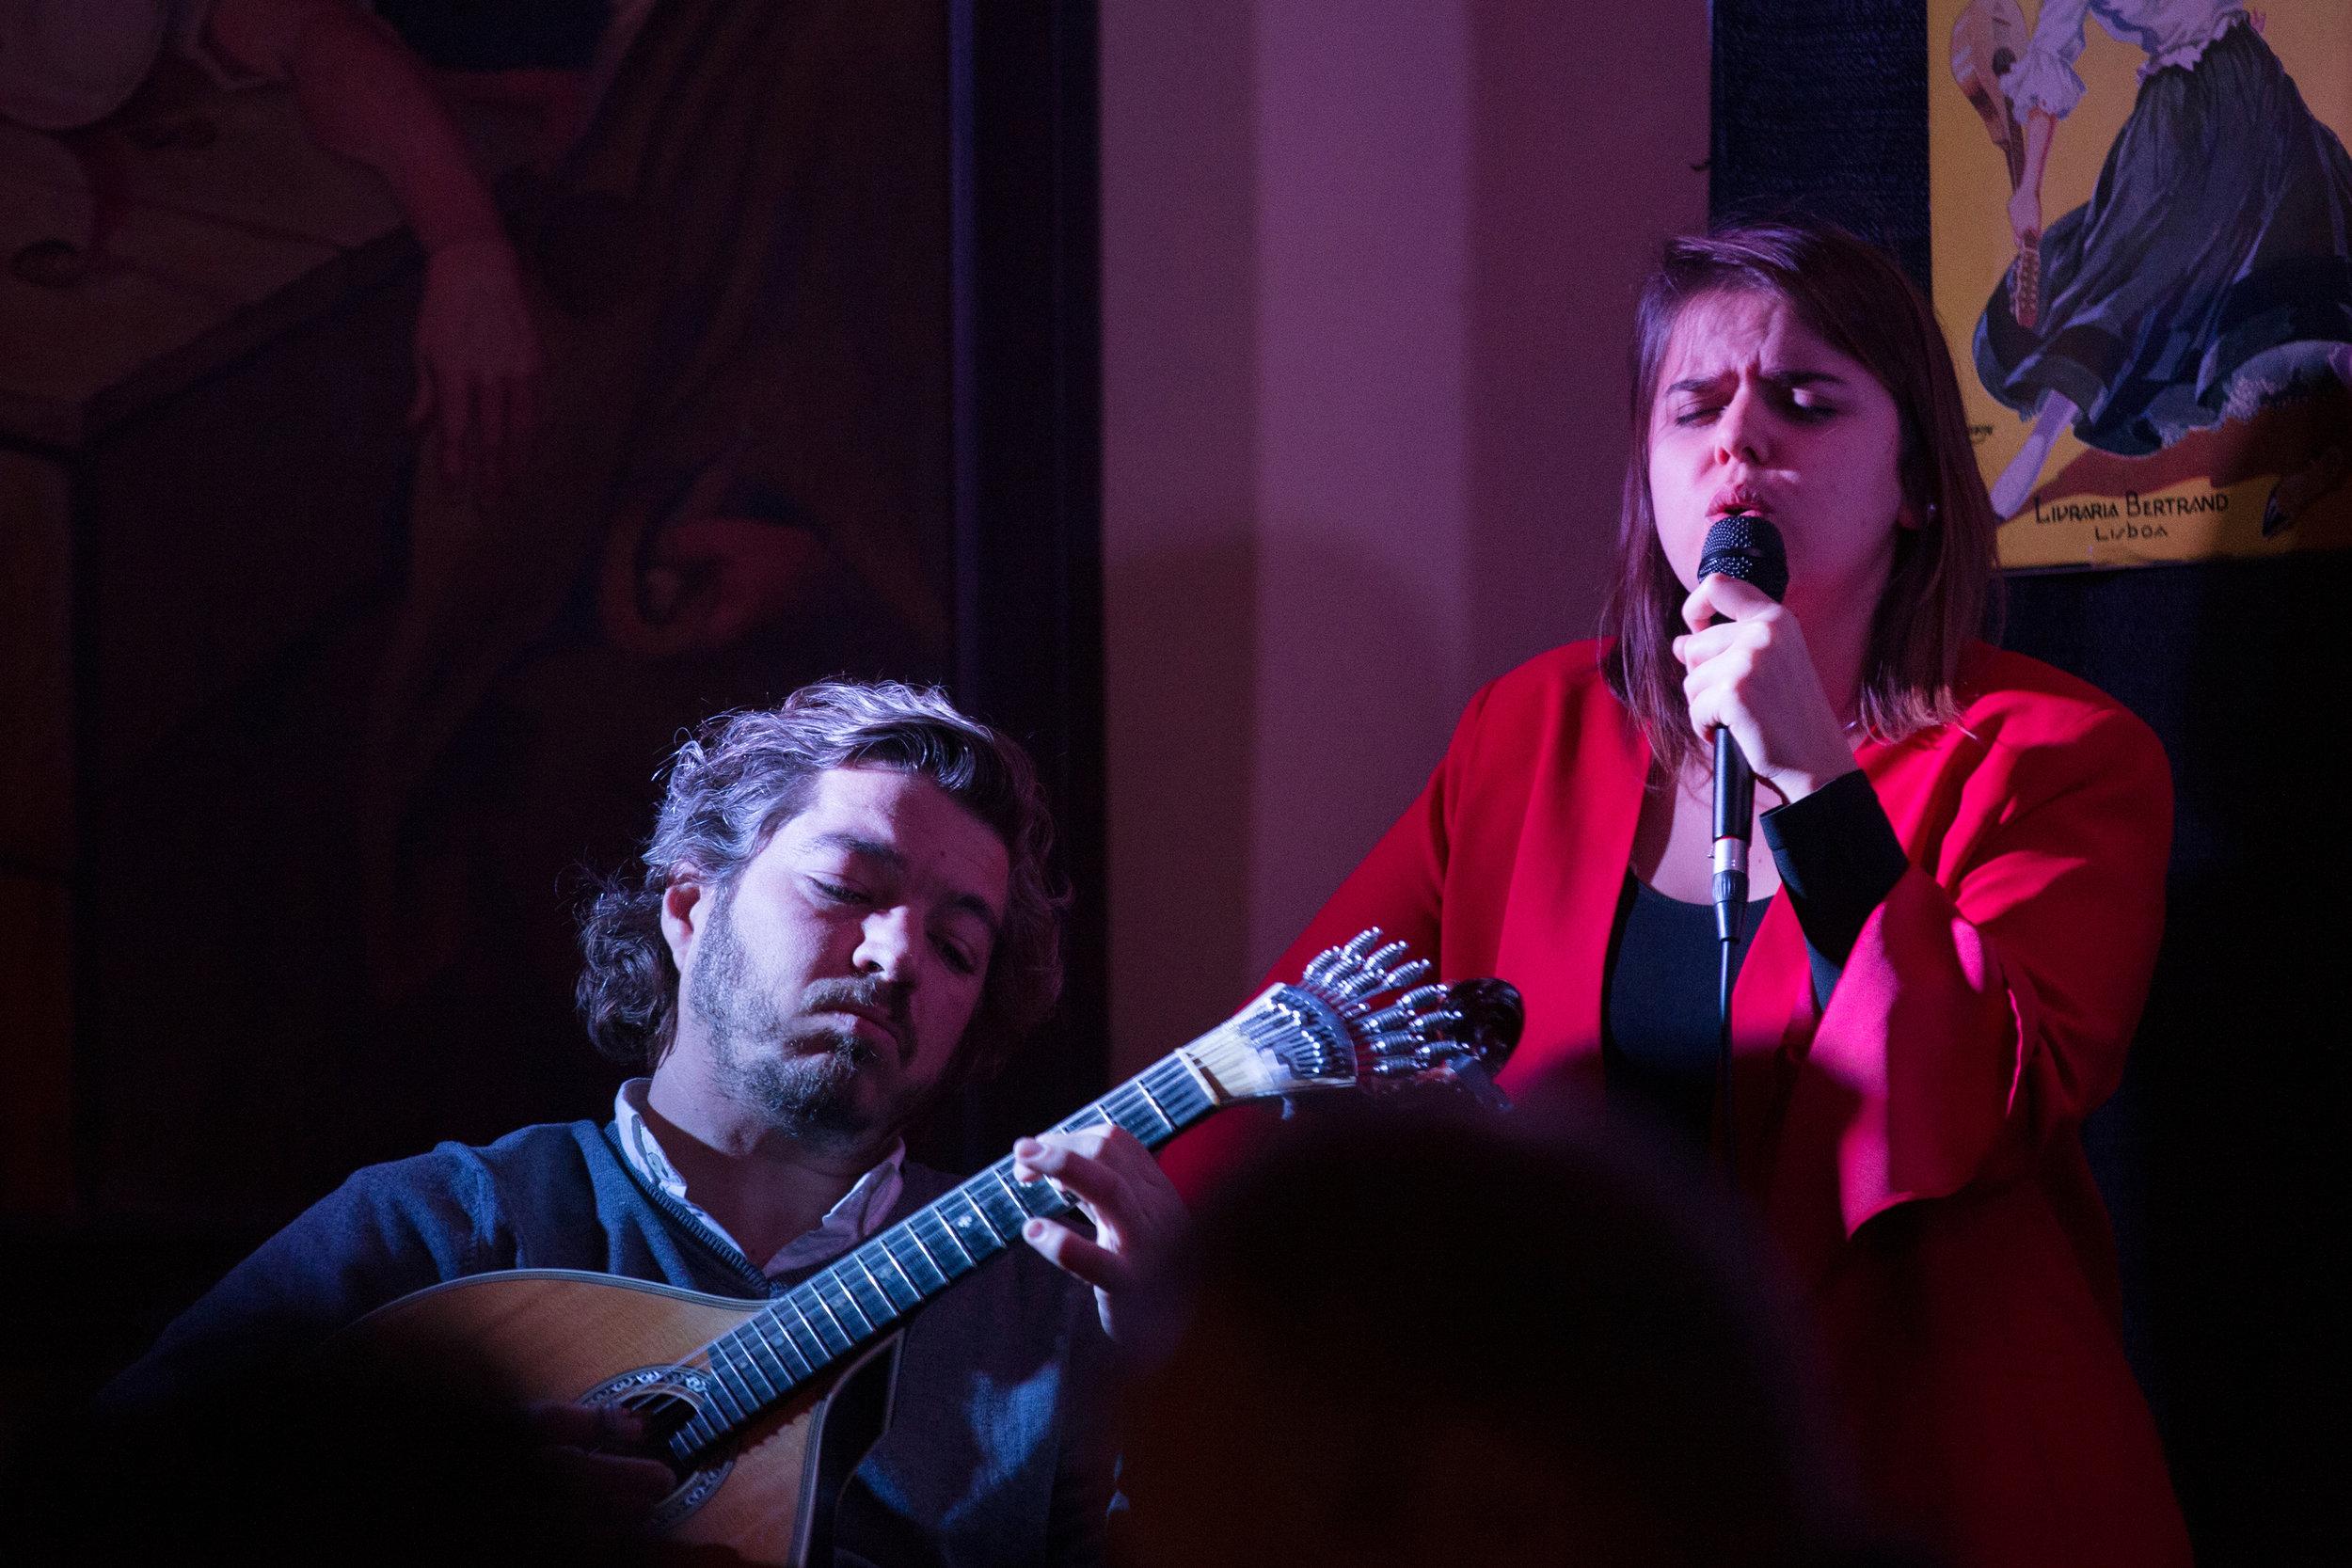 Teresinha Landeiro singing fado accompanied by Pedro de Castro on Portuguese guitar at the Sports Club Portugues in Newark's Ironbound neighborhood, part of Livesounds Fado Festival